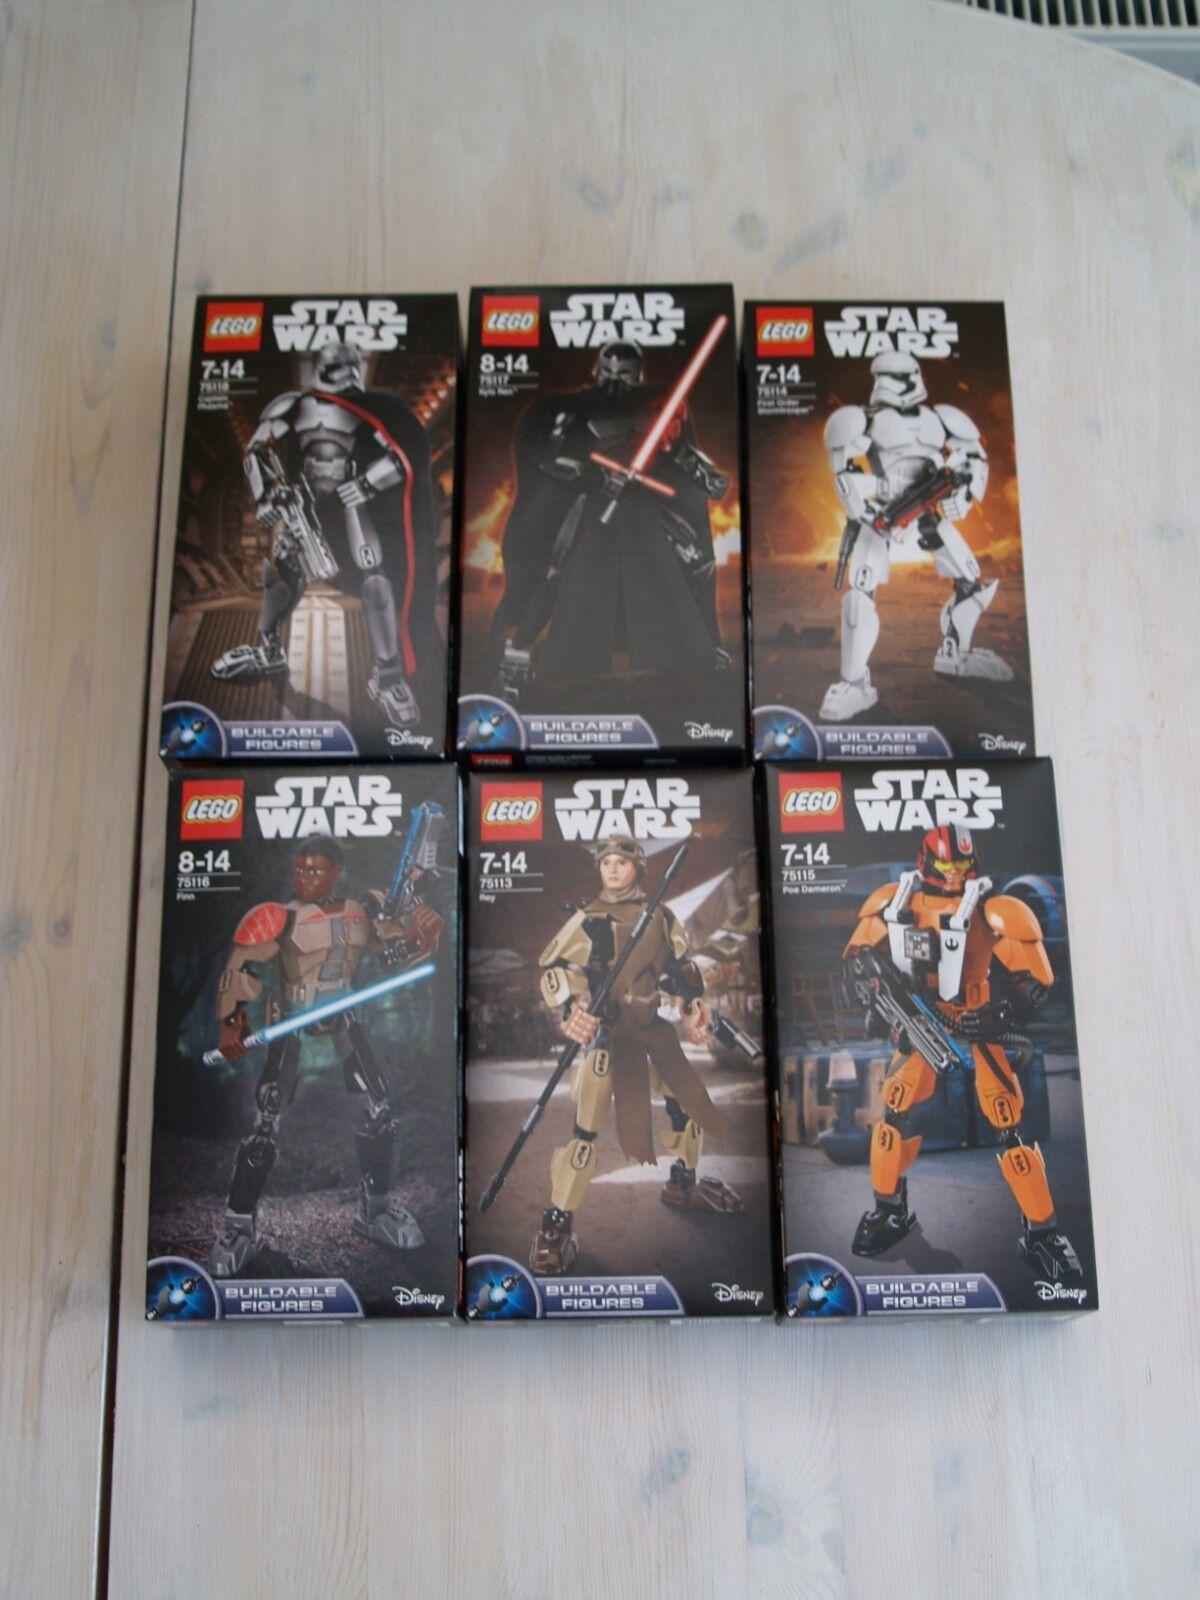 BNIB Lego Star Wars Buildable Figures Series 2 incl Phasma, Kylo Ren etc